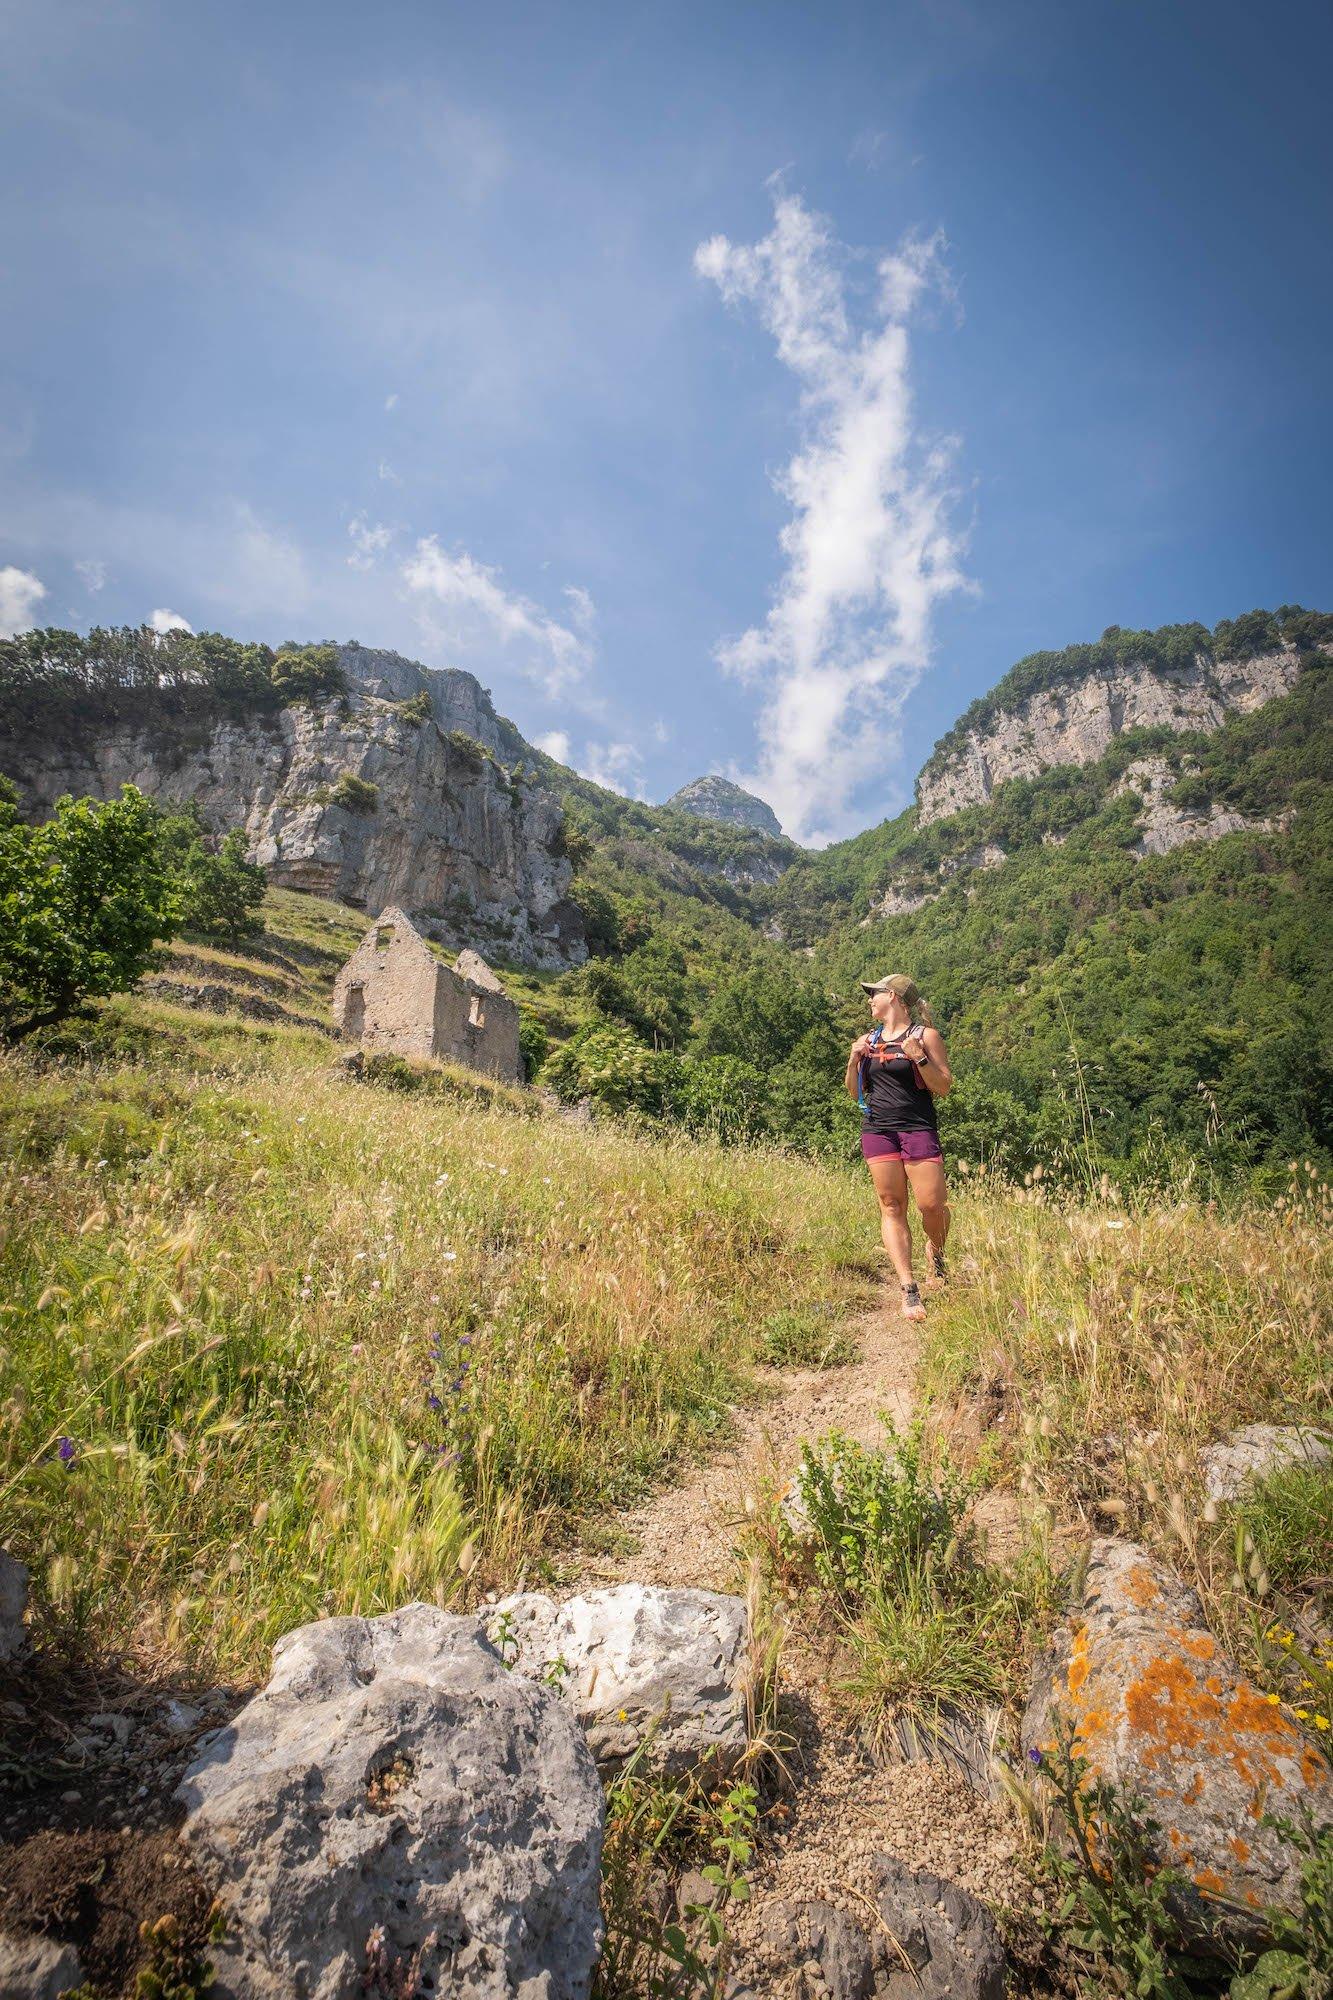 Natasha hiking on the path of the Gods